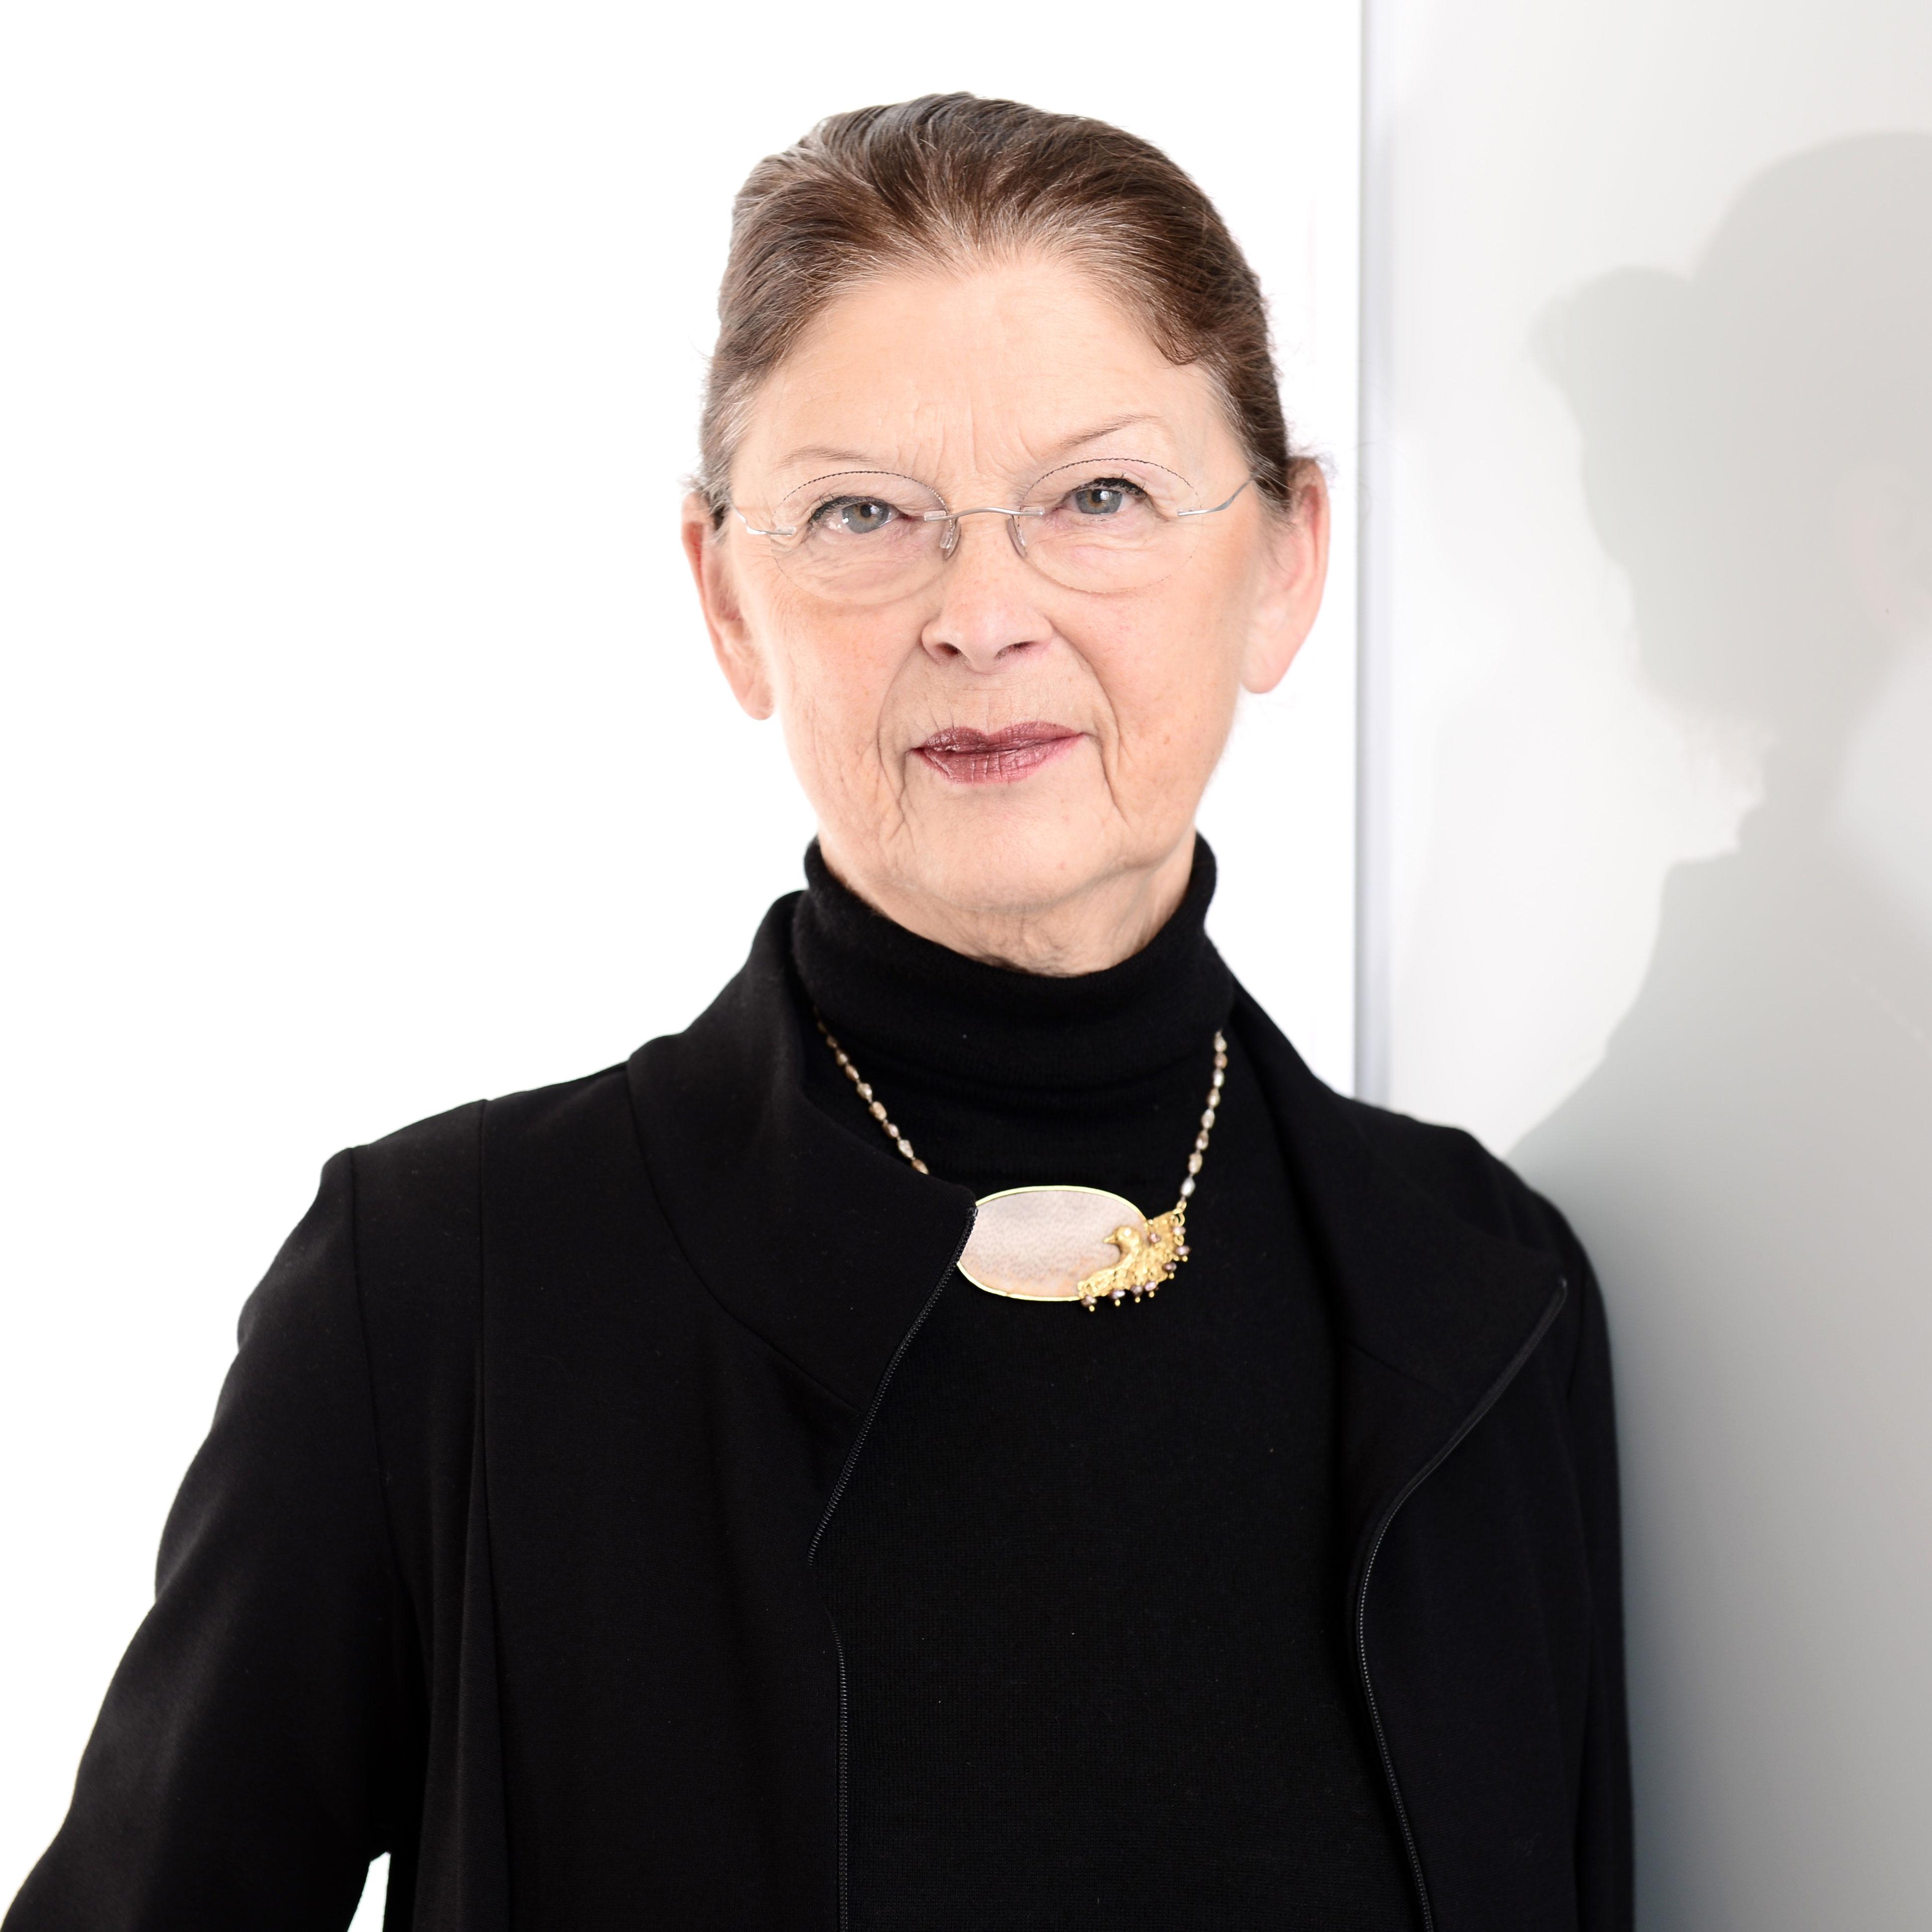 Karin Melchior